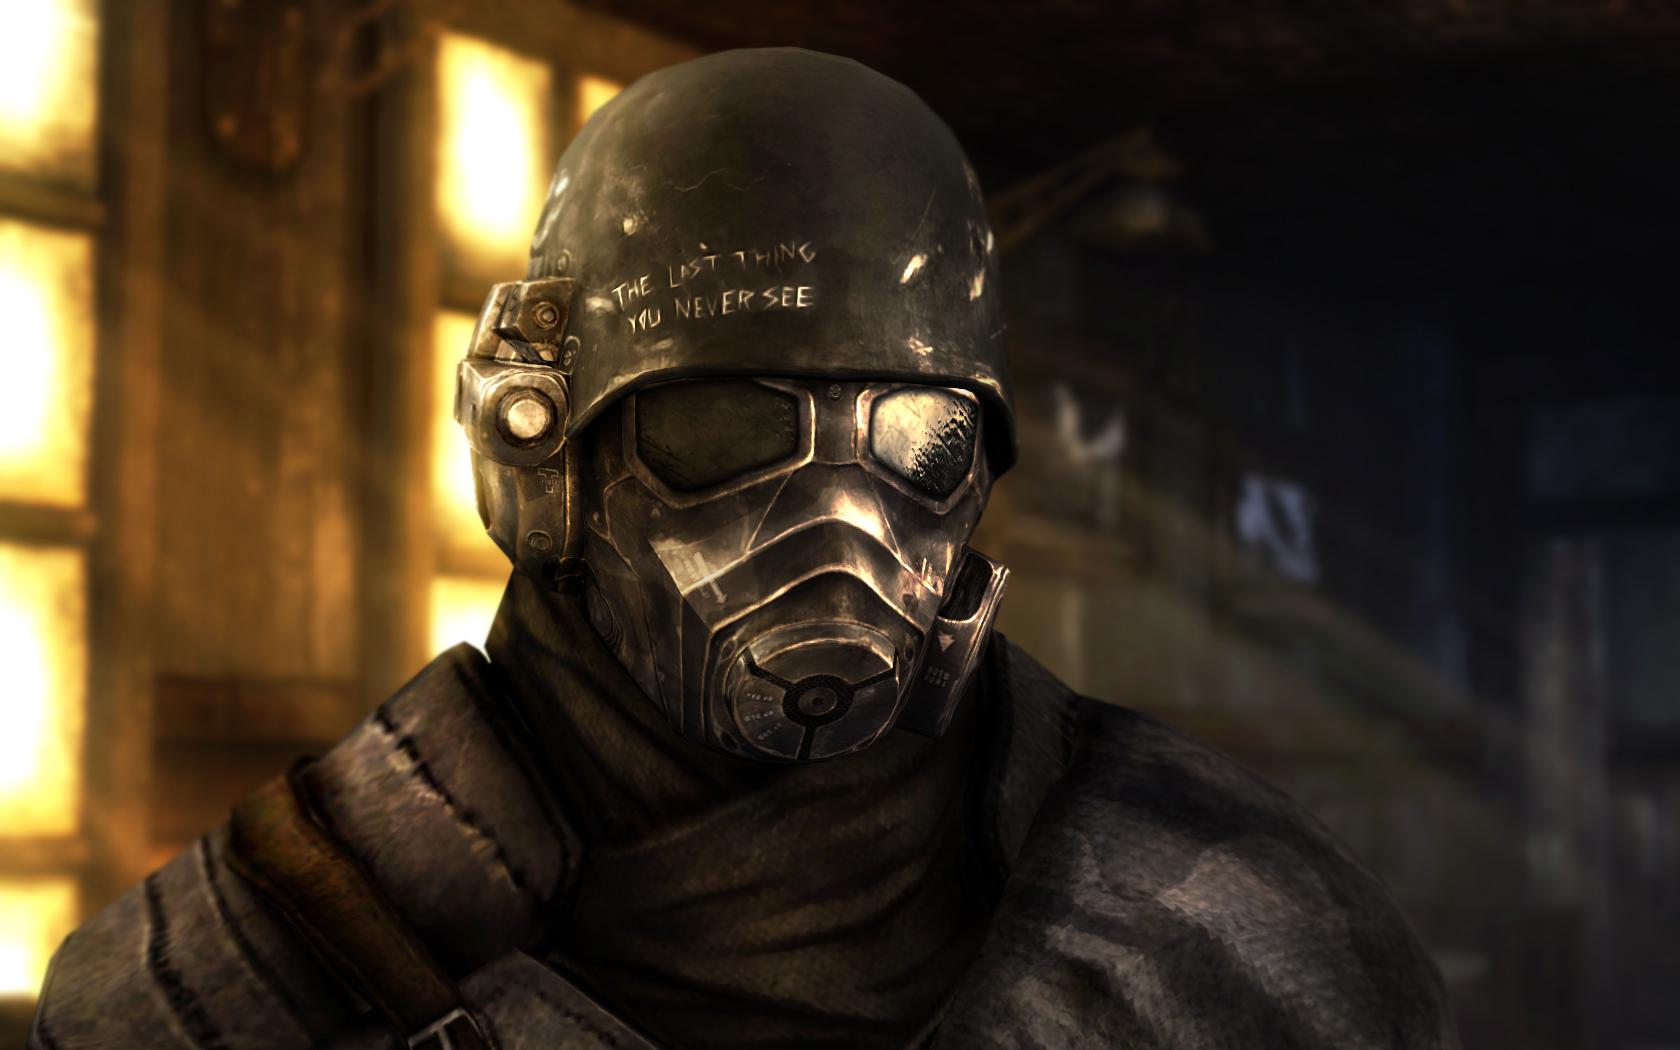 TFH 1st Recon Helmet для Fallout New Vegas для Fallout: New Vegas - Скриншот 1